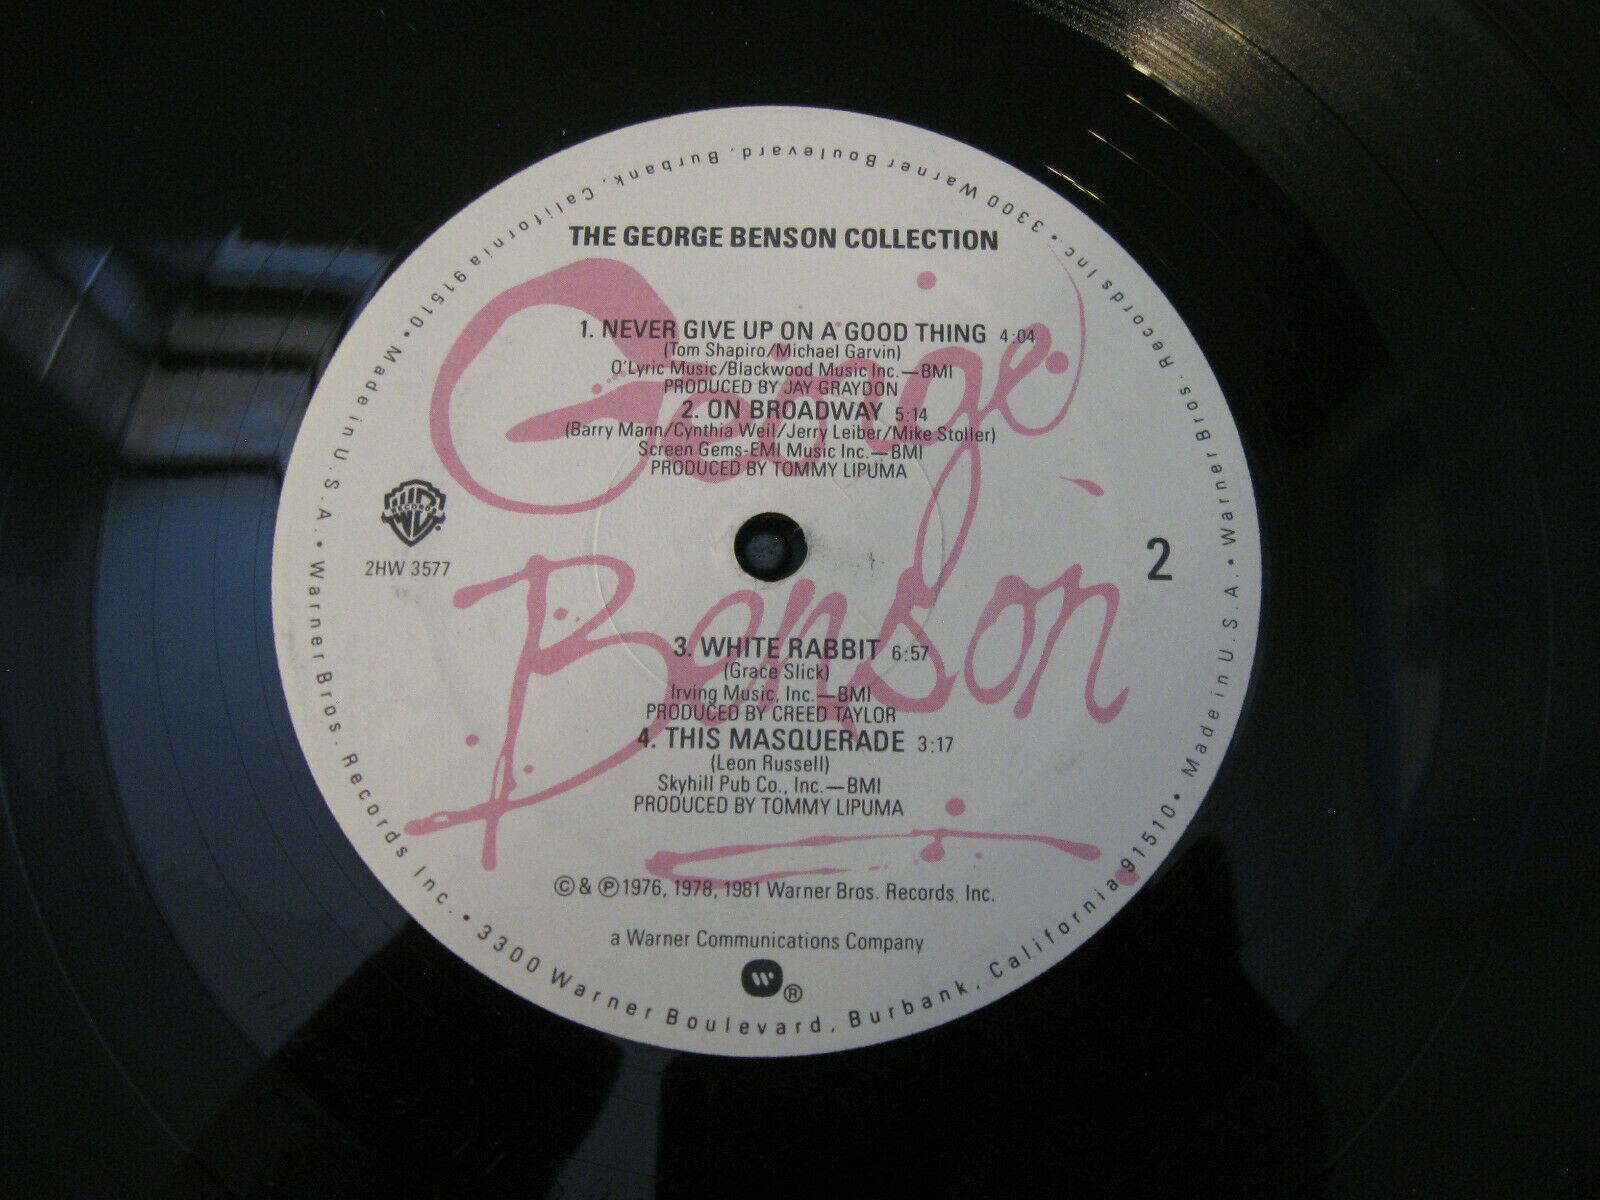 The George Benson Collection Warner Bros 2HW 3577 Stereo Vinyl Record LP Album image 6